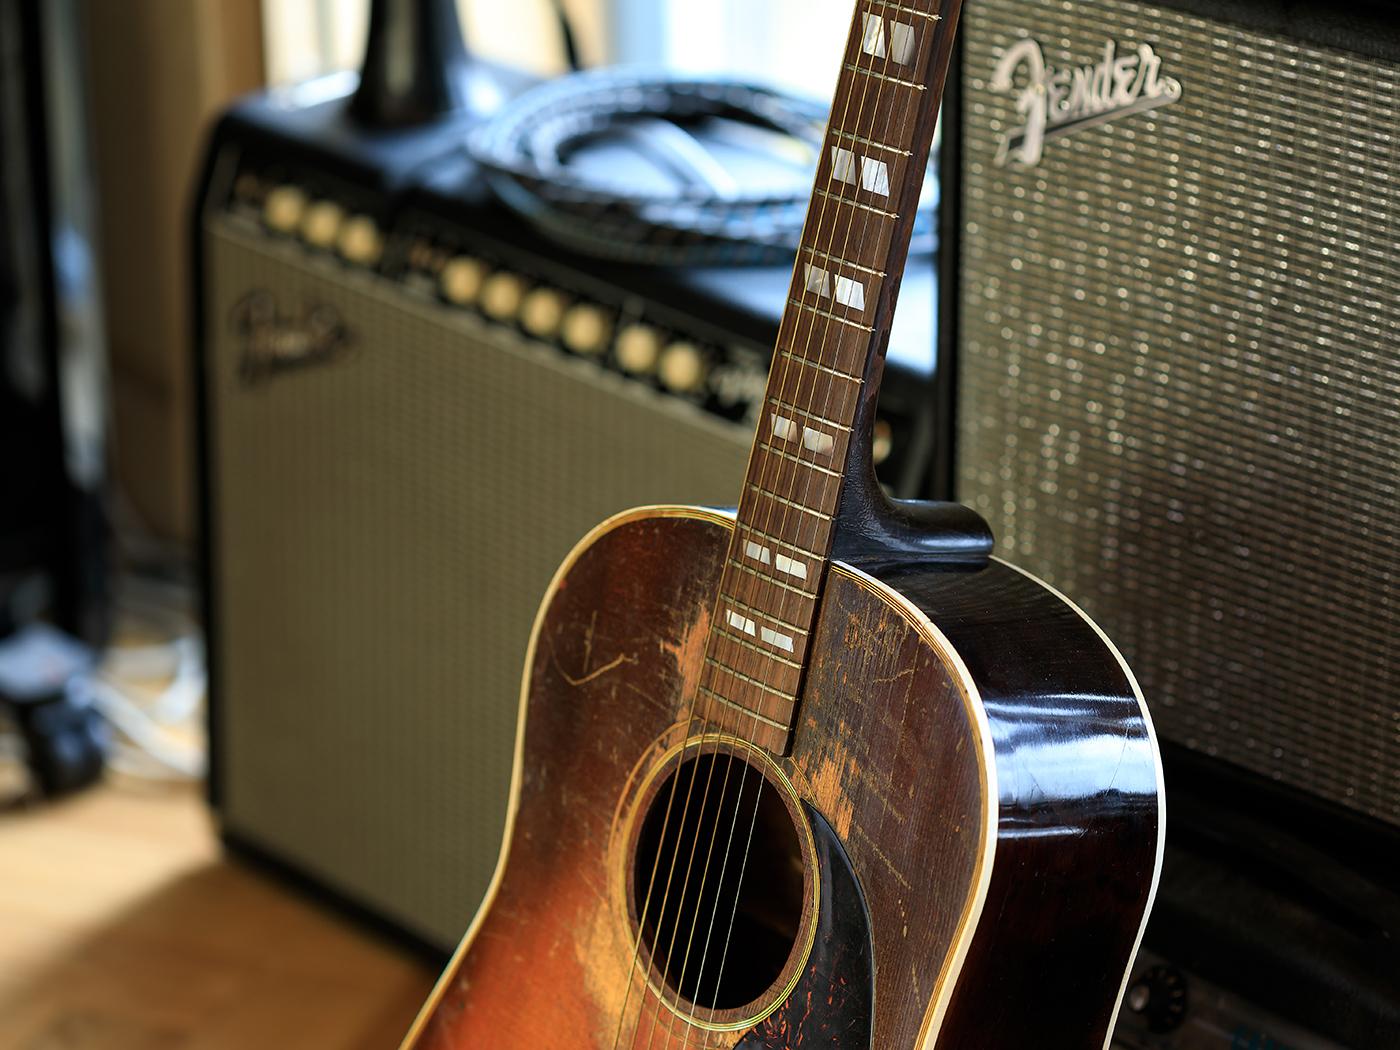 edwyn collins vintage gibson acoustic guitar